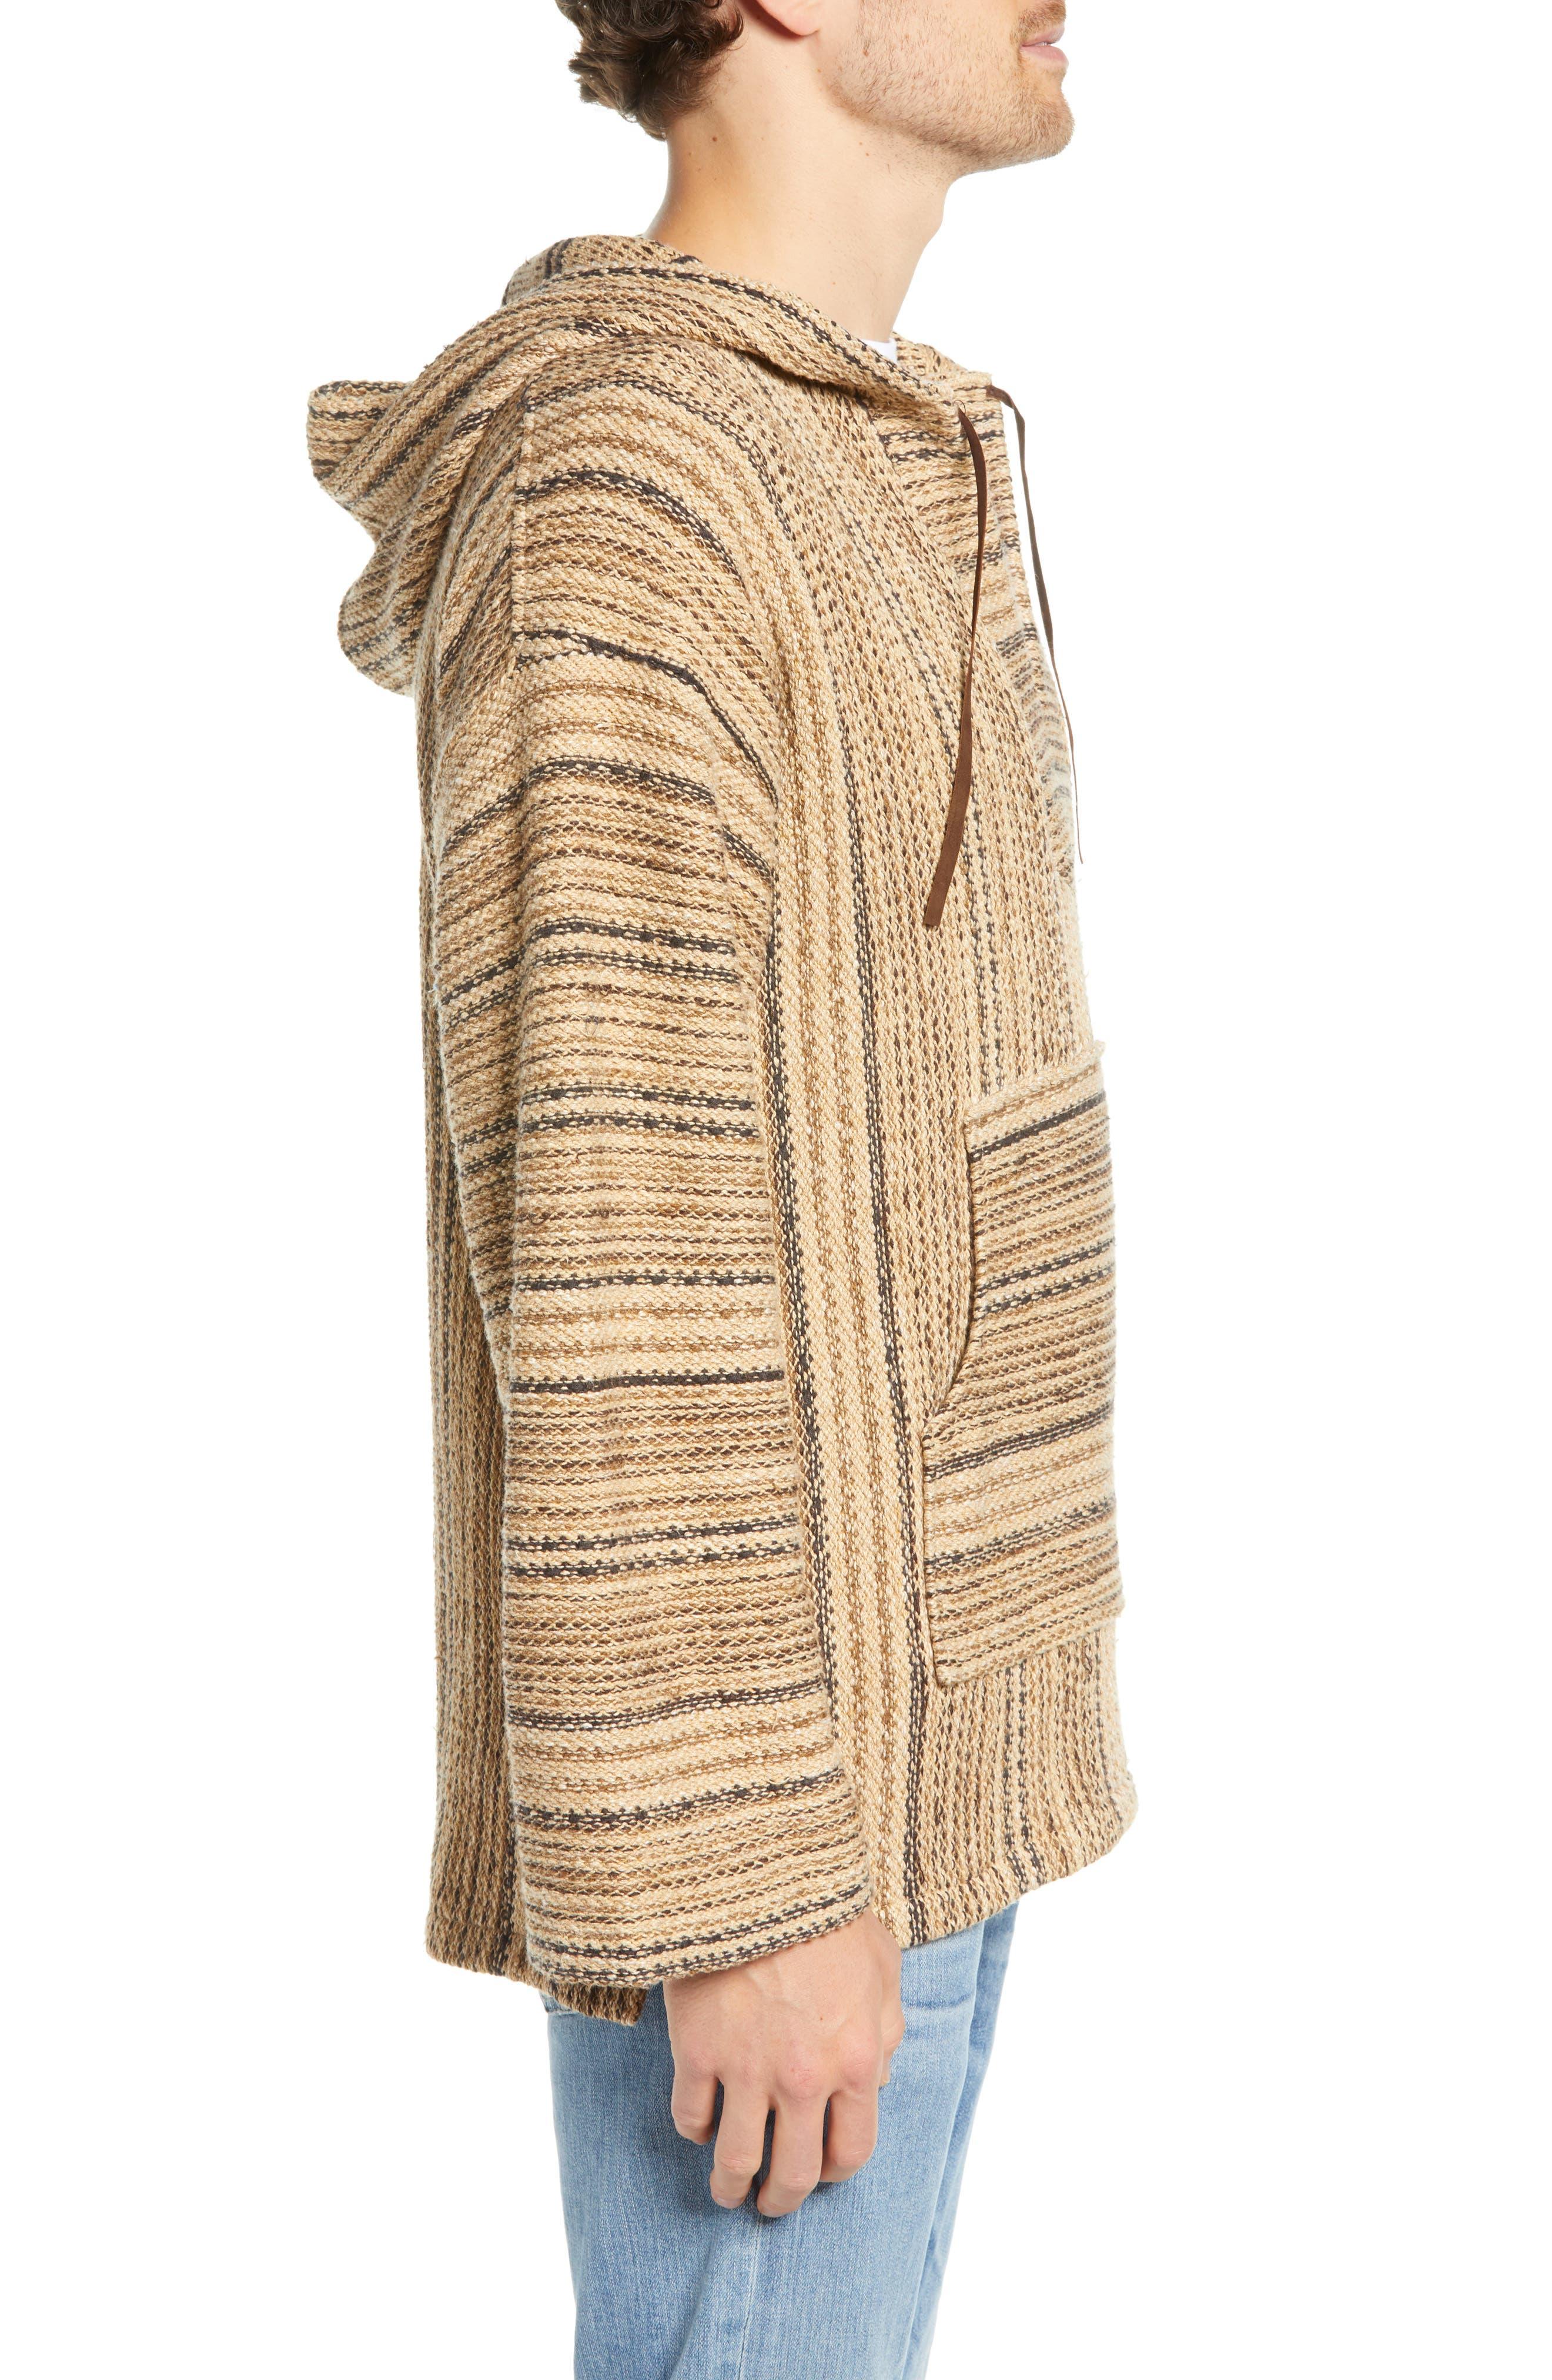 FRYE, Baja Hooded Pullover, Alternate thumbnail 3, color, TAOS TAUPE STRIPE